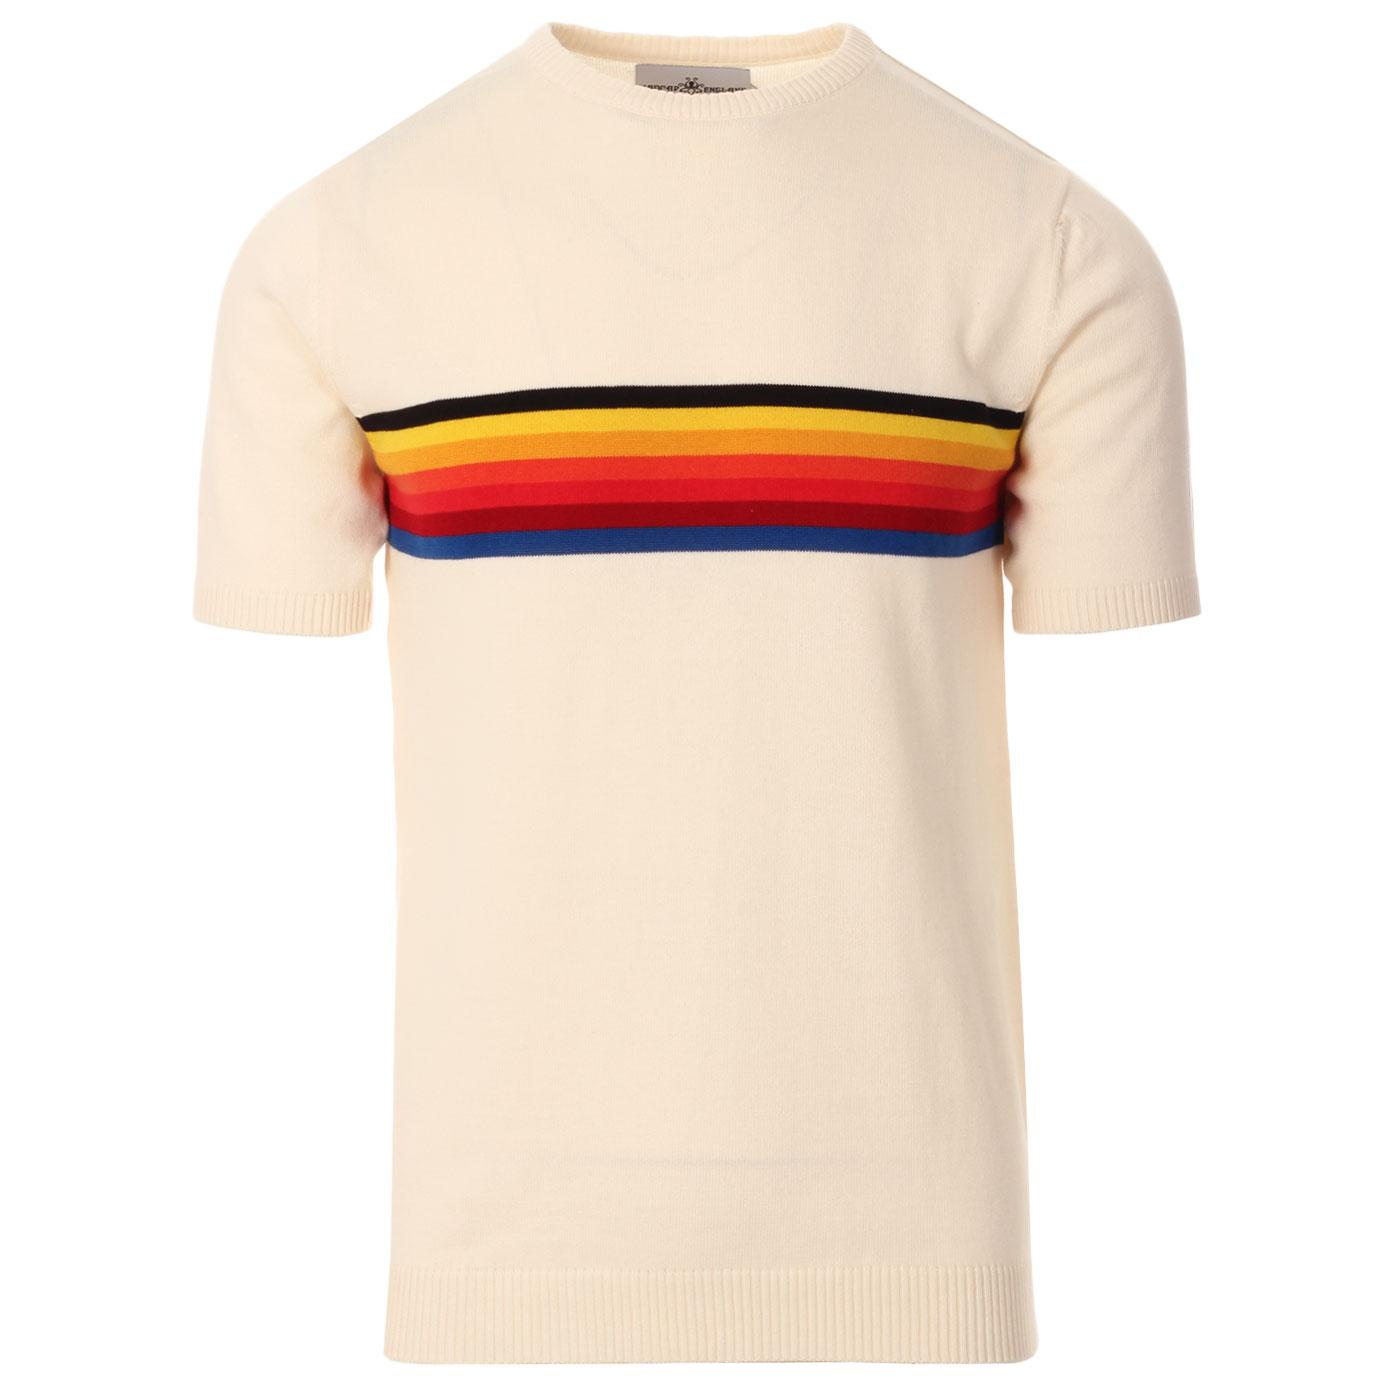 Britpop MADCAP ENGLAND Rainbow Stripe Knit Tee (E)